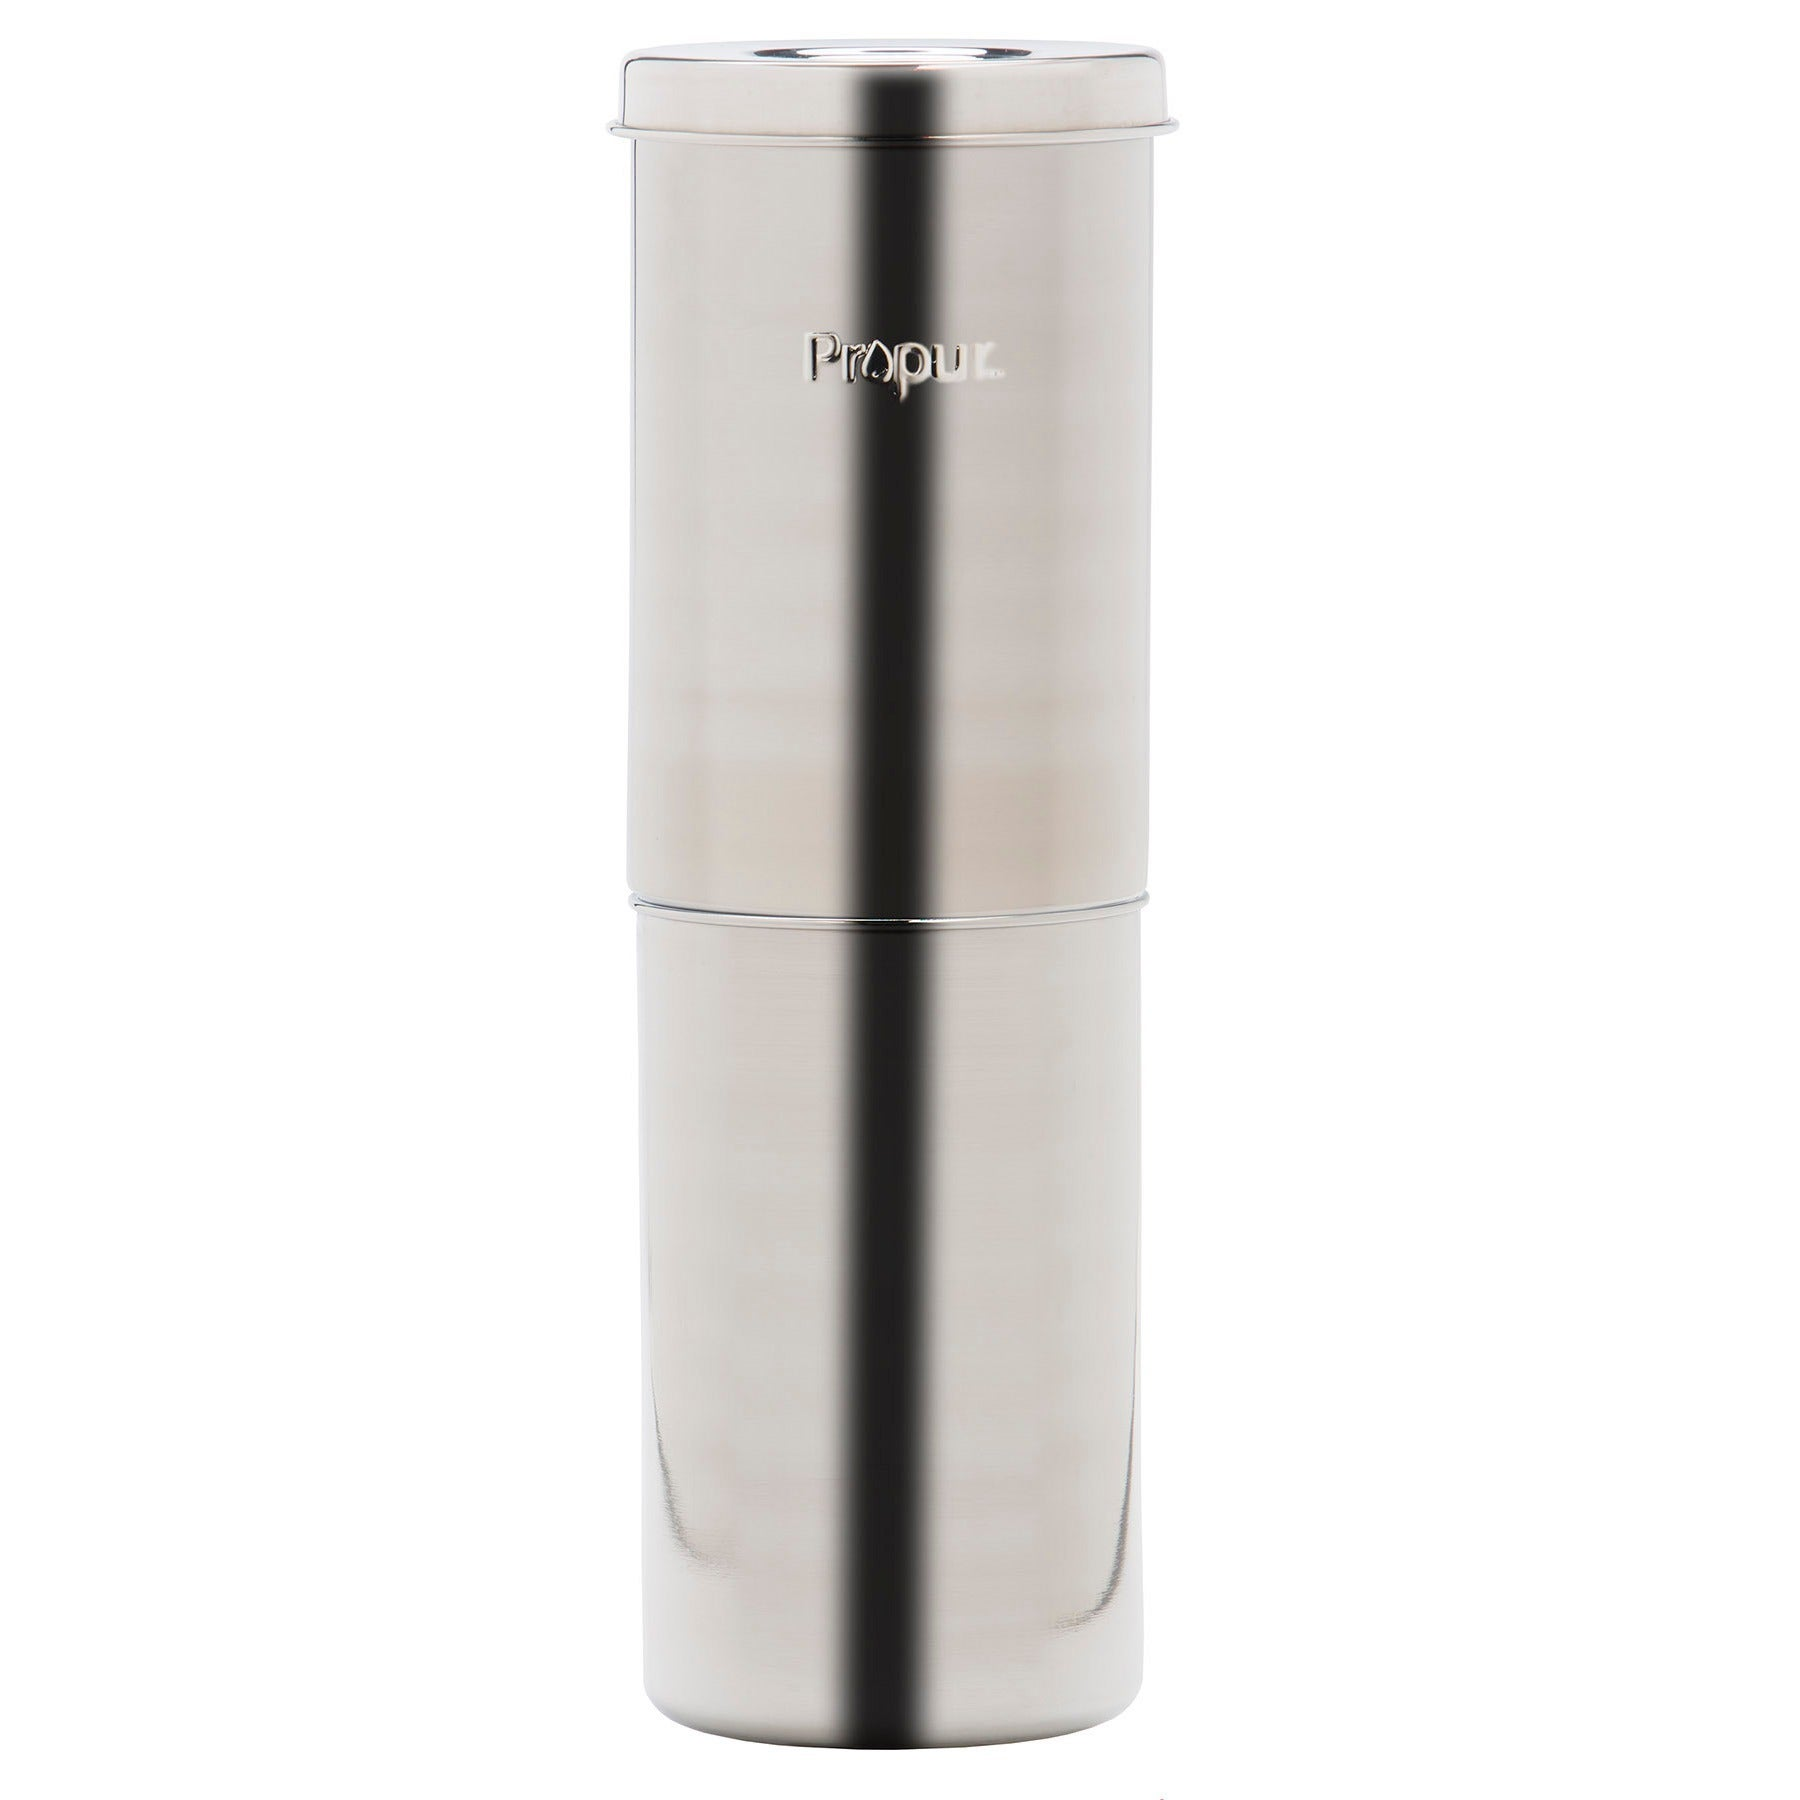 Propur Water Filters 2-7 ProOne G2.0 SlimLine Filters